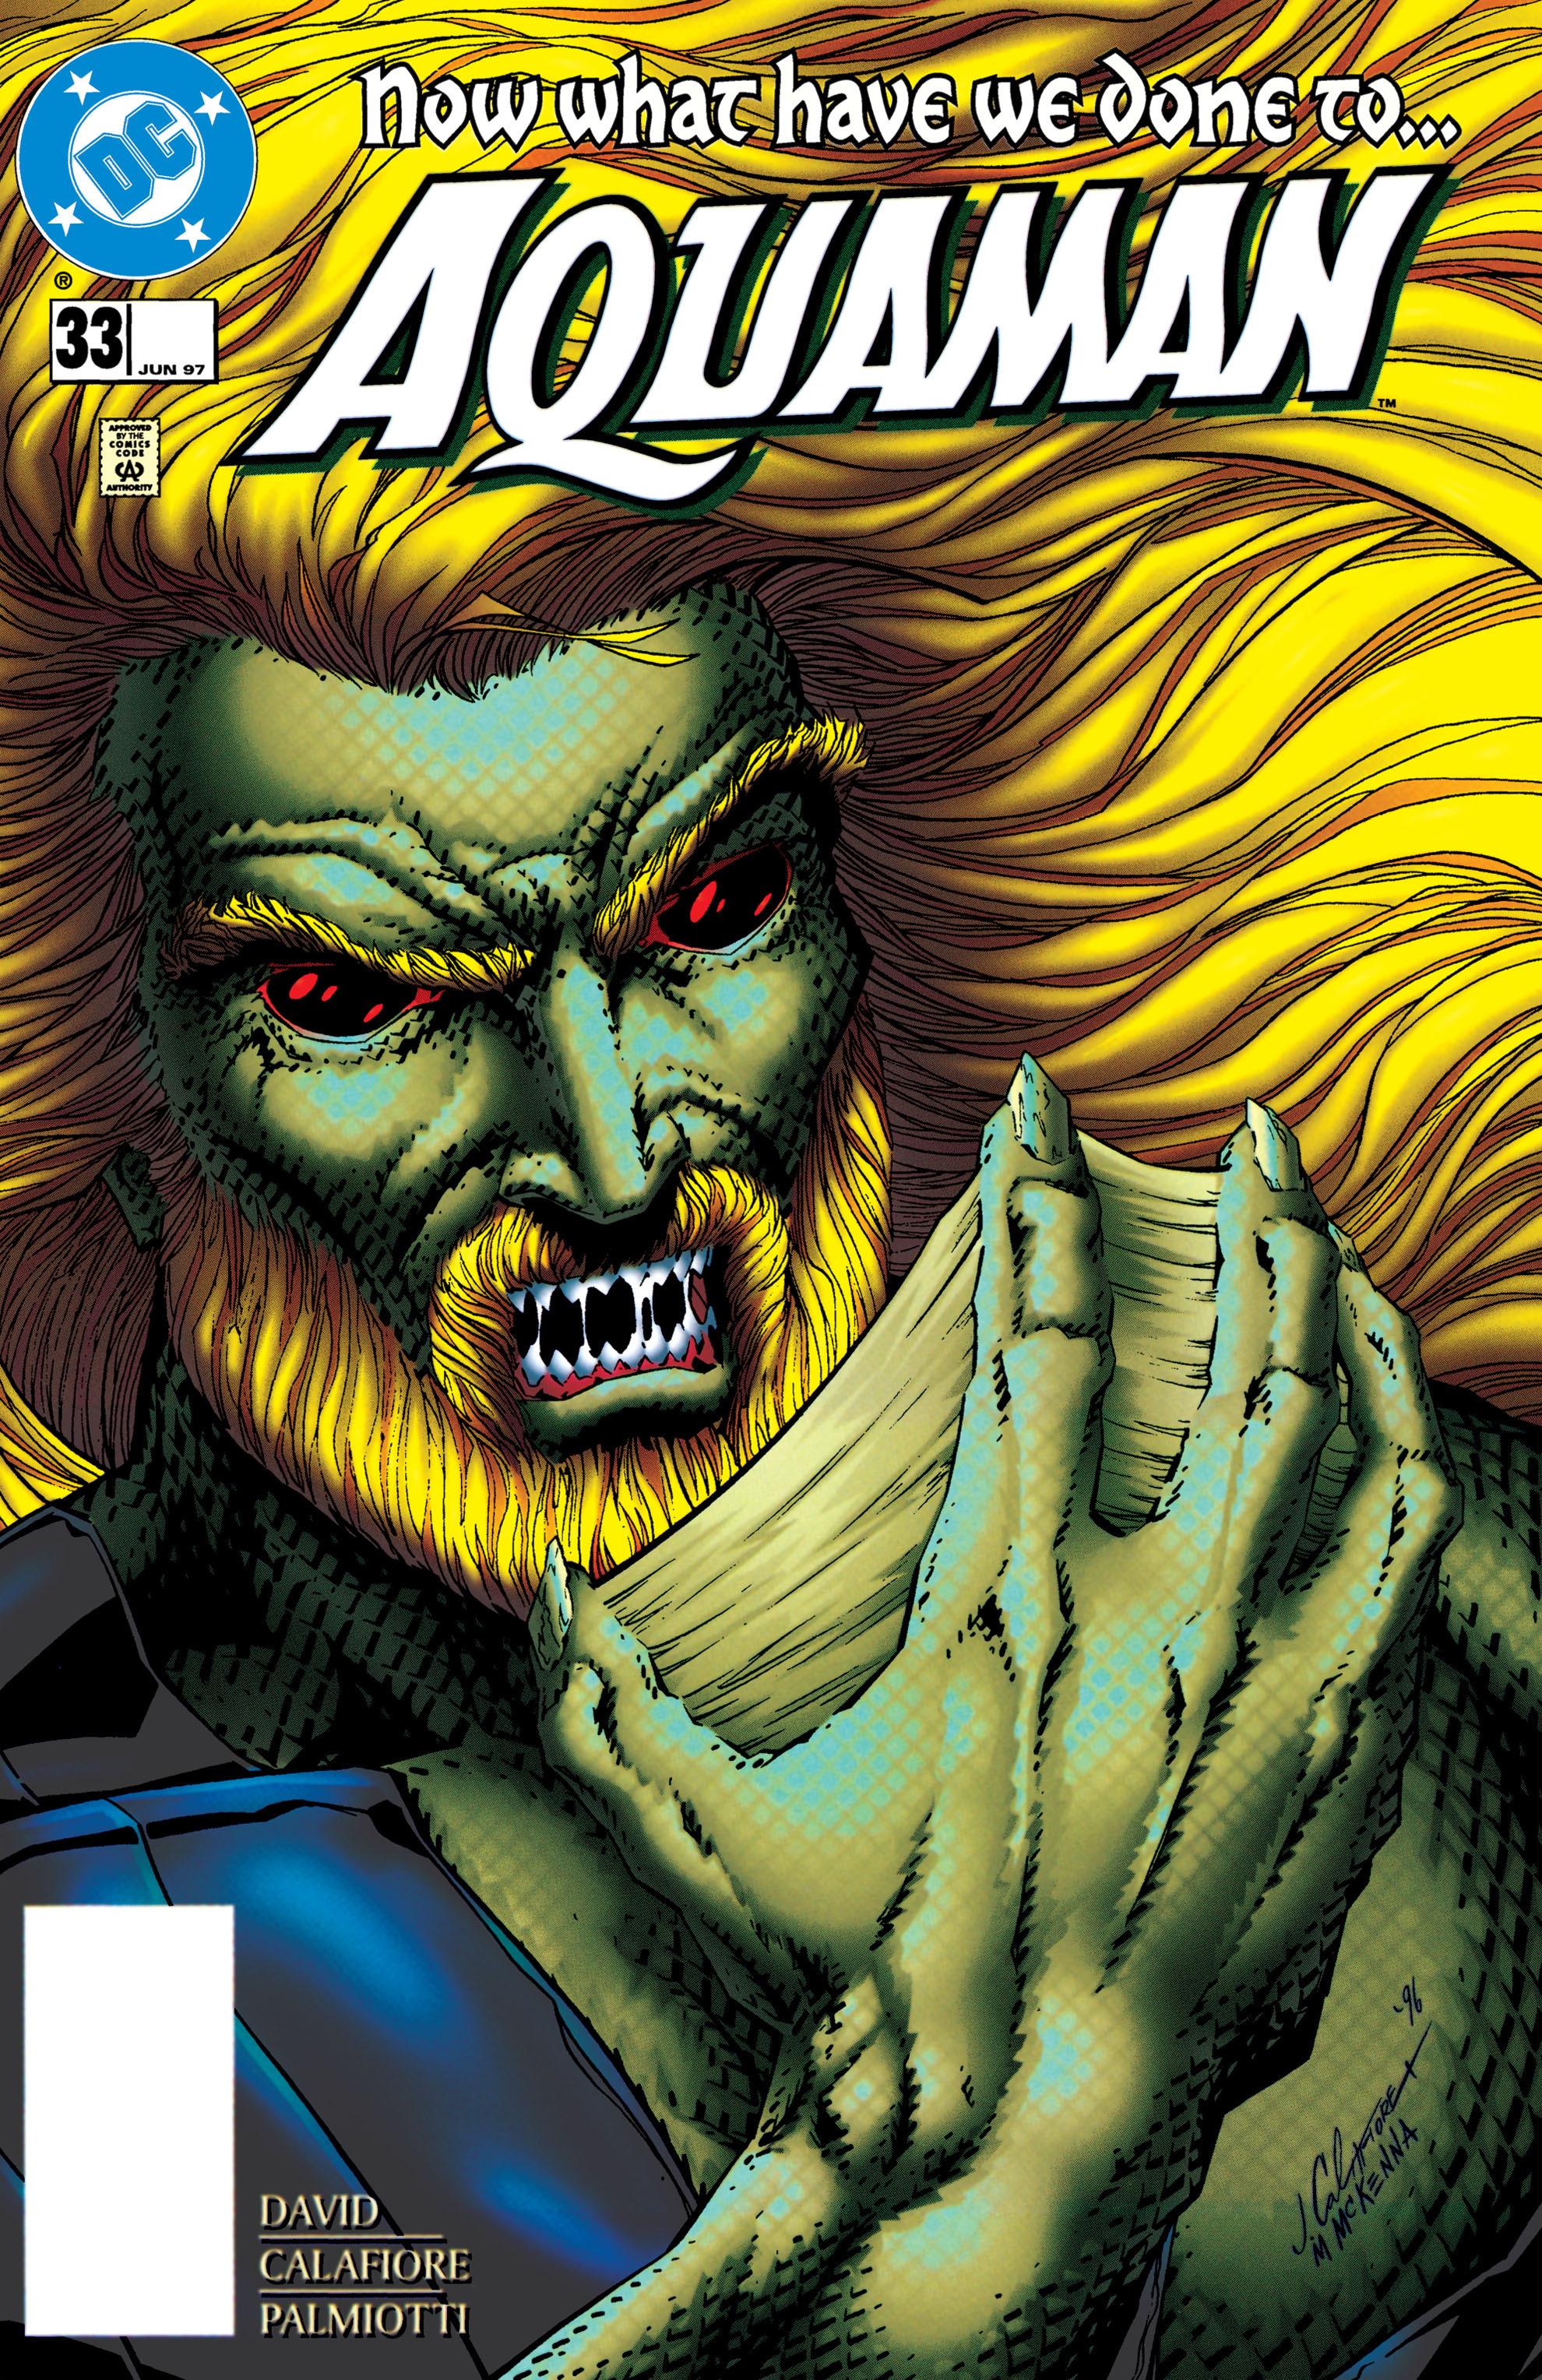 Read online Aquaman (1994) comic -  Issue #33 - 1